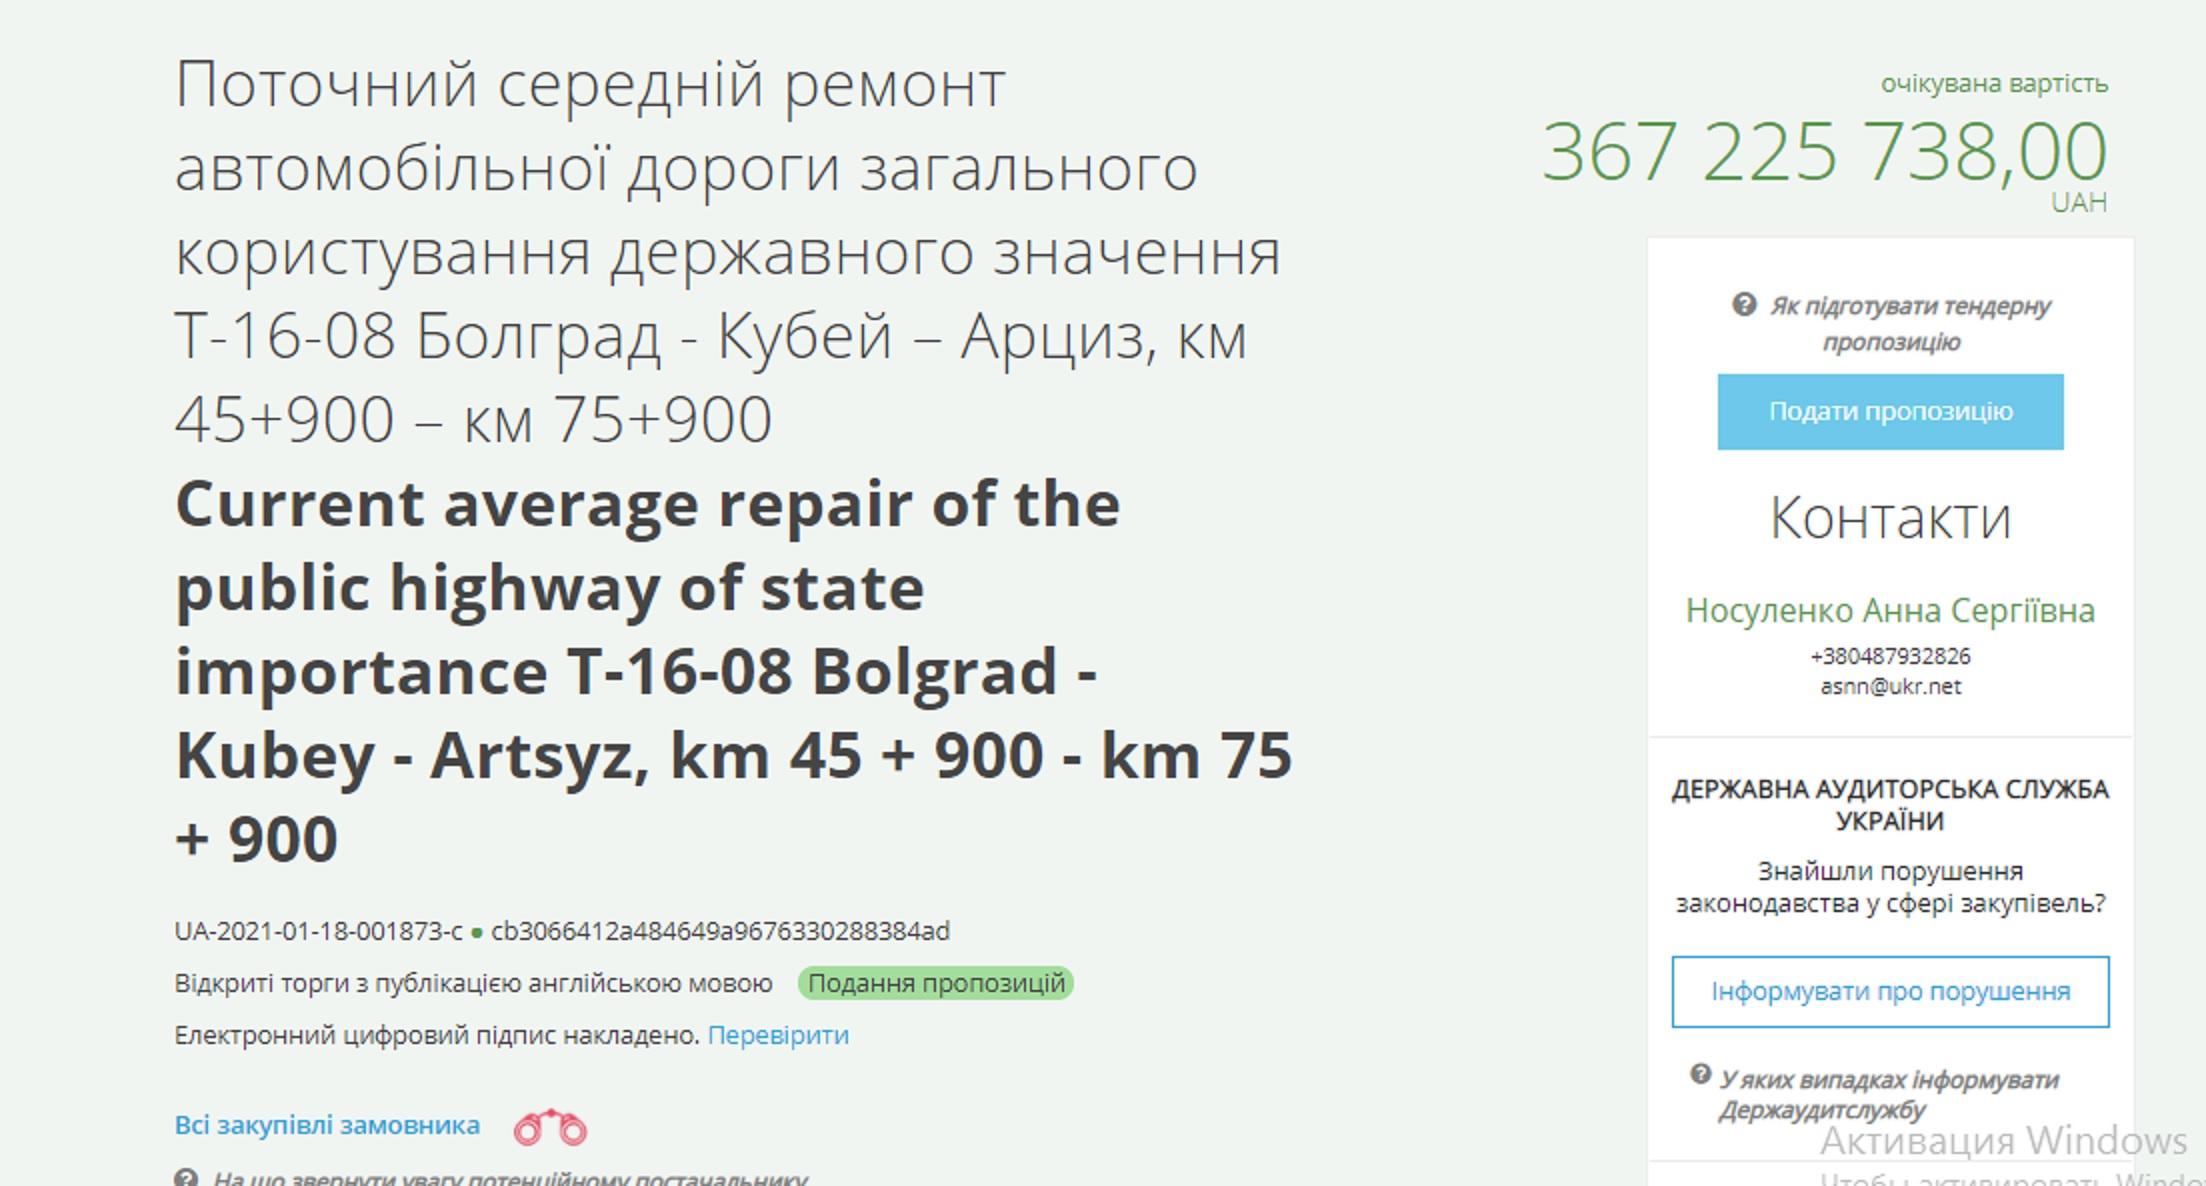 САД ищет подрядчика для ремонта 30 км автодороги Т-16-08 Болград - Кубей – Арциз